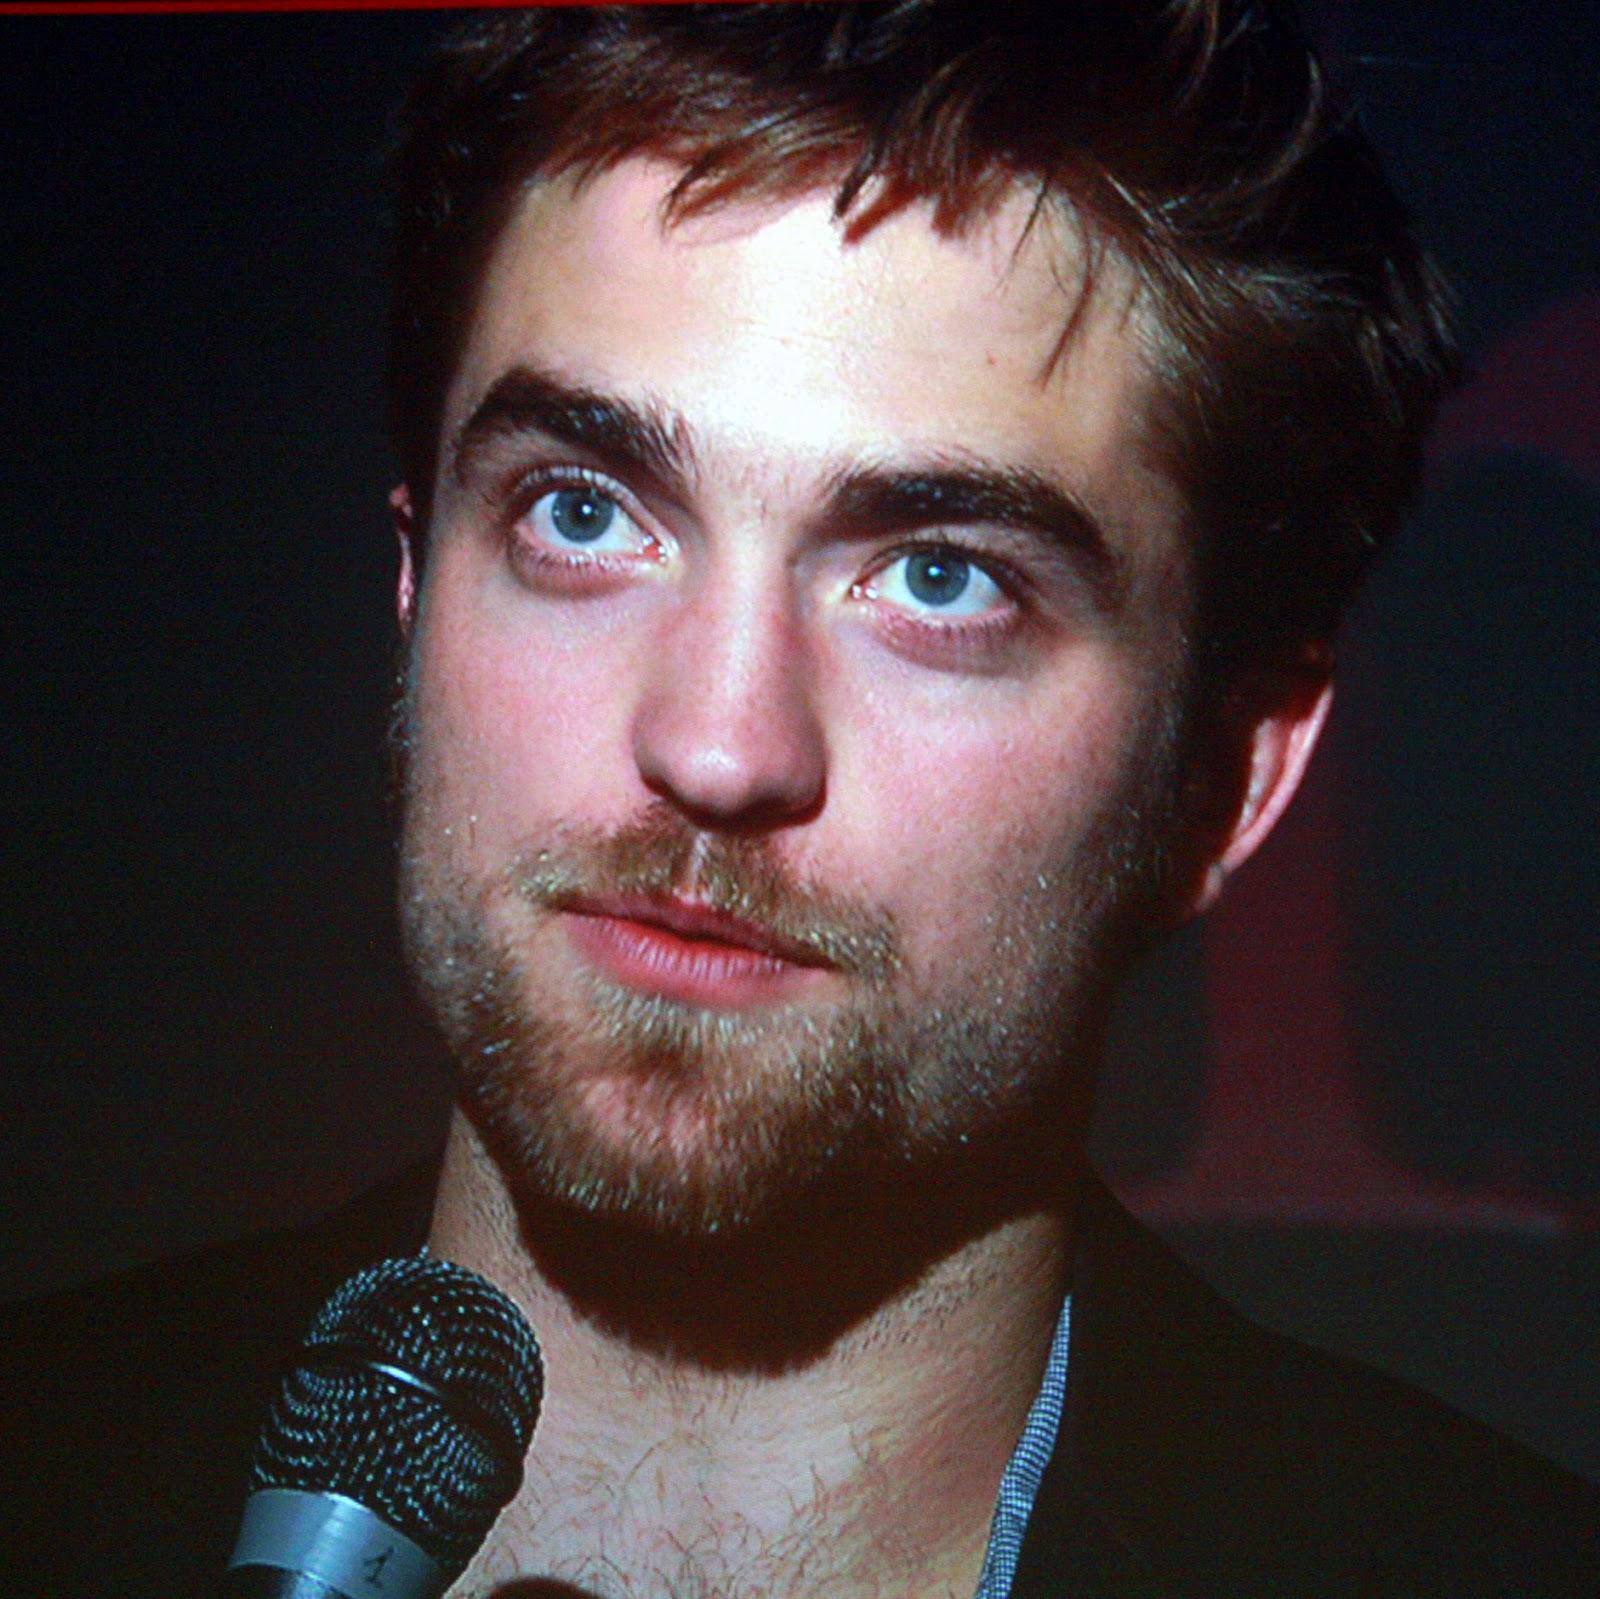 http://3.bp.blogspot.com/-yvTBV7mXd3Y/UDR7CRcN5uI/AAAAAAAAAx8/3jigFBBVV2Q/s1600/Robert_Pattinson_2,_2011.jpg